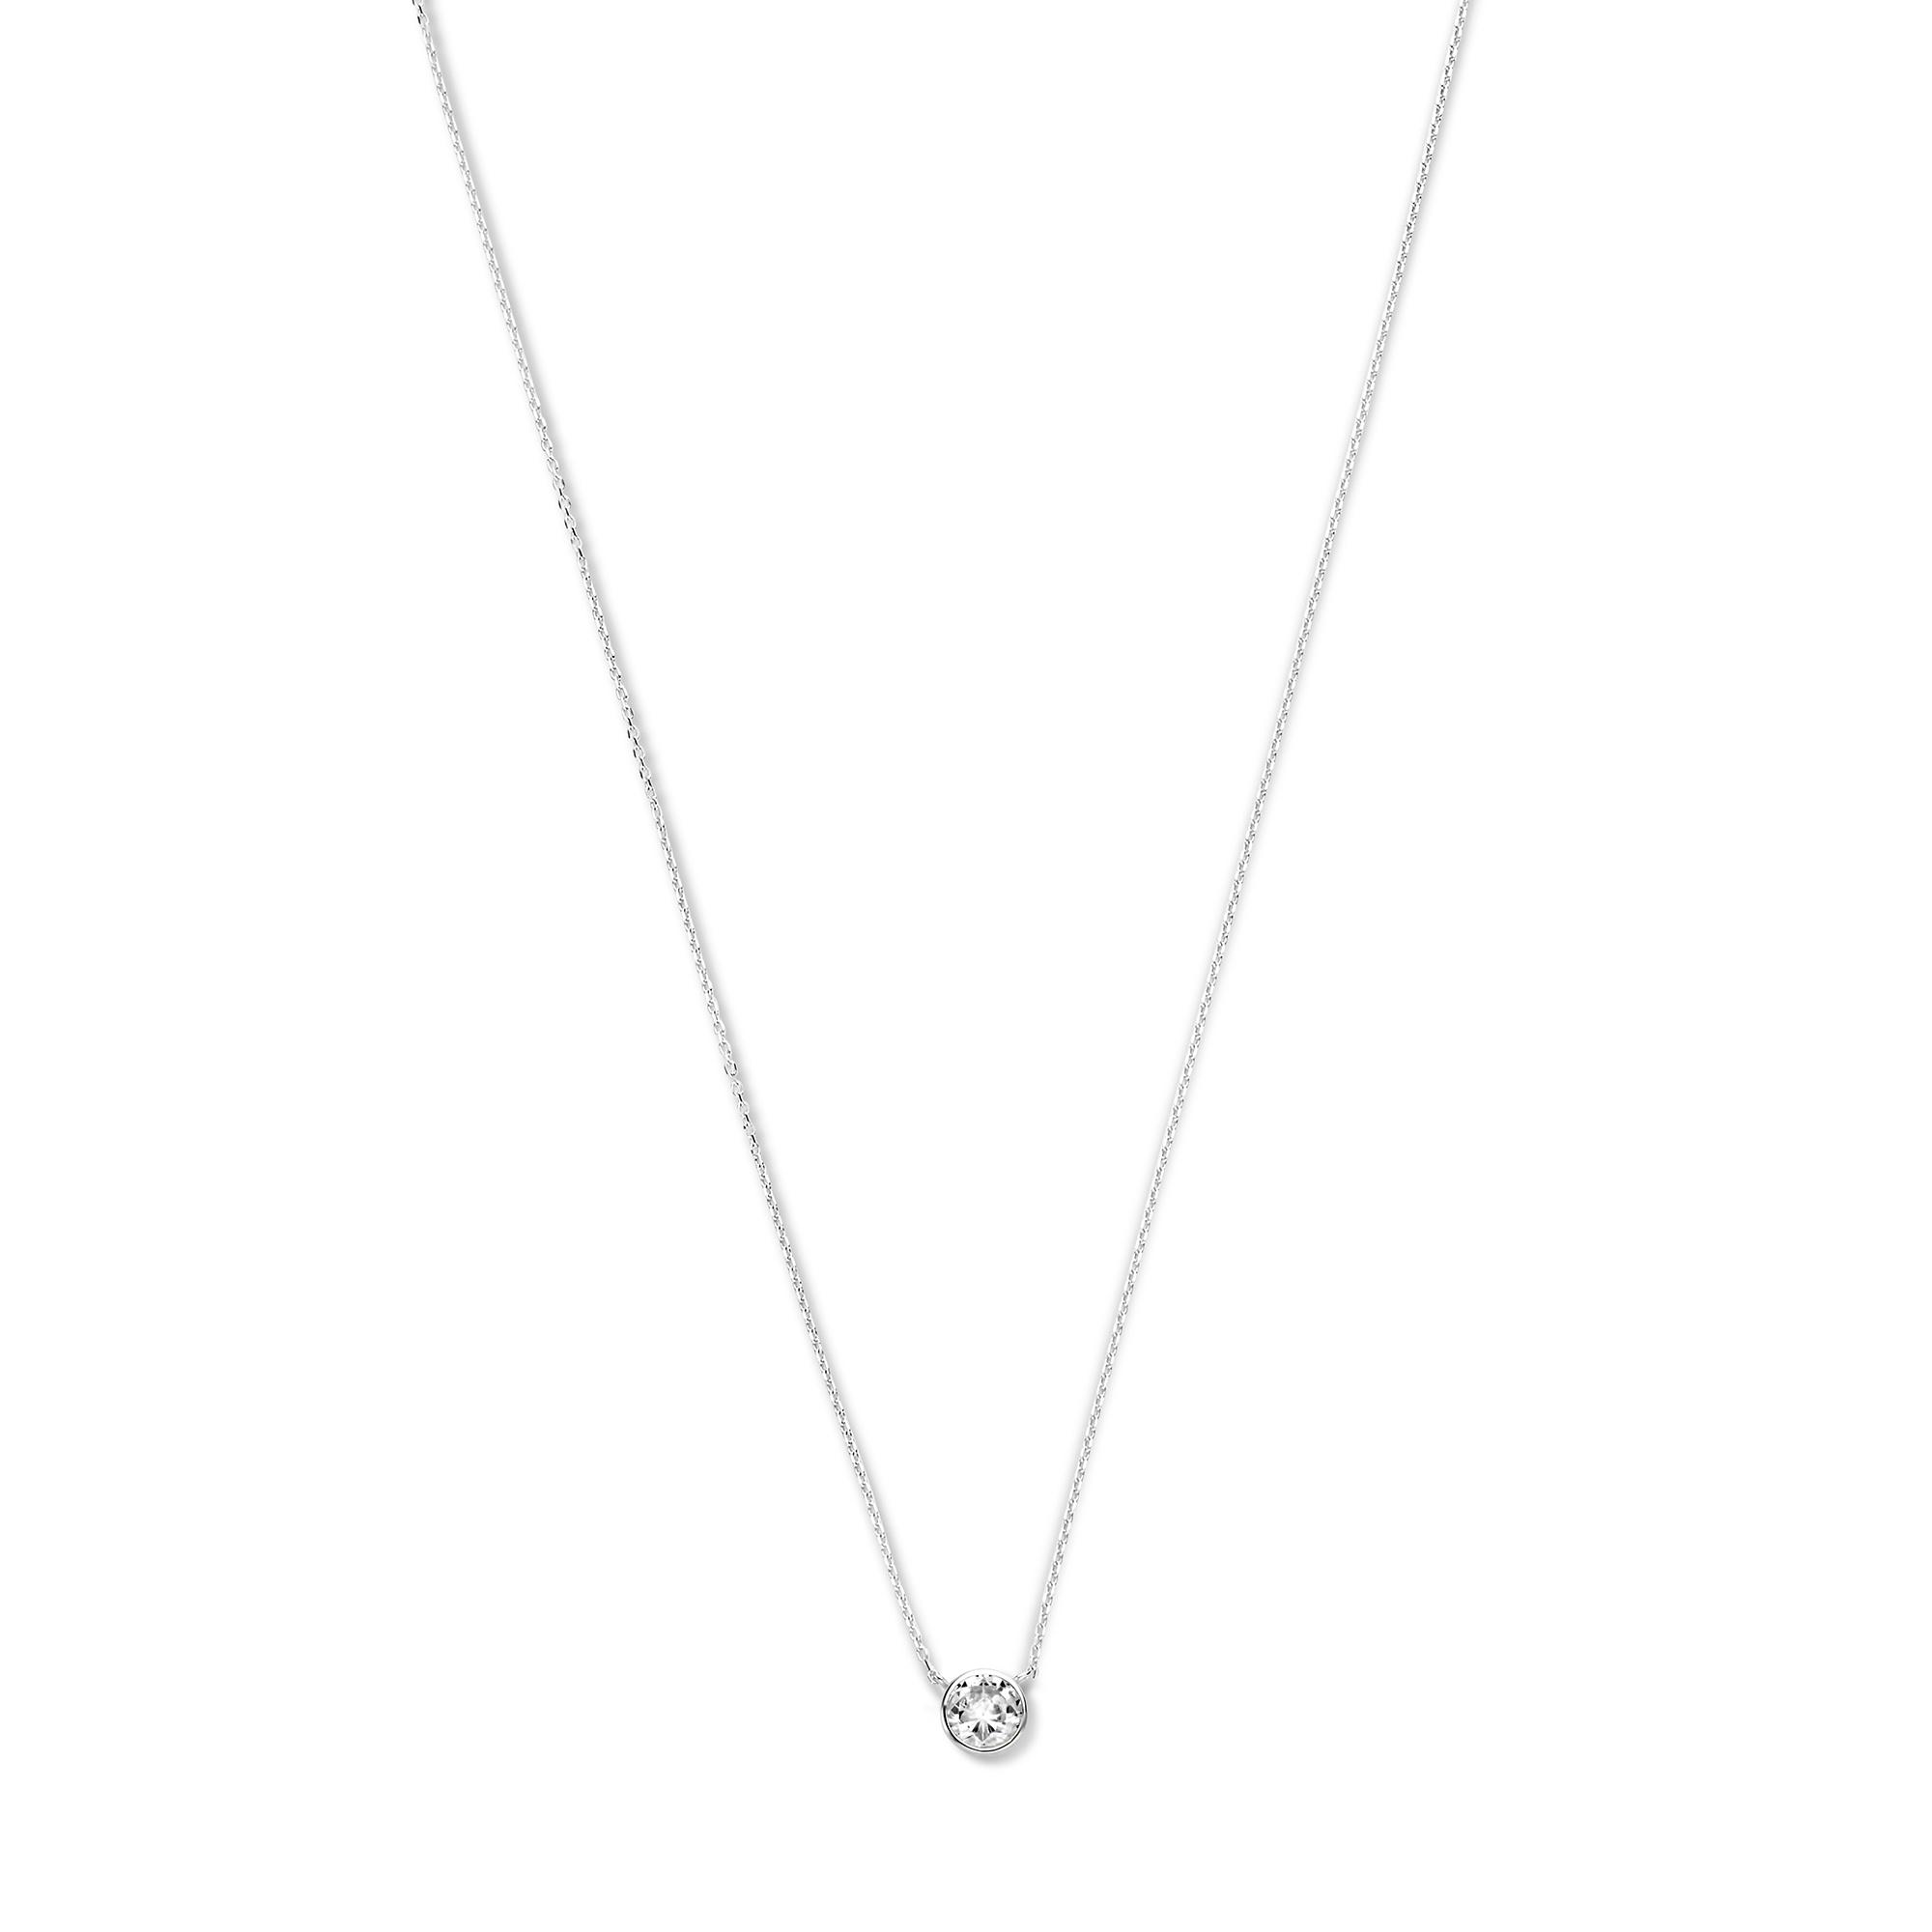 Violet Hamden Venus 925 sterling silver necklace with birthstone